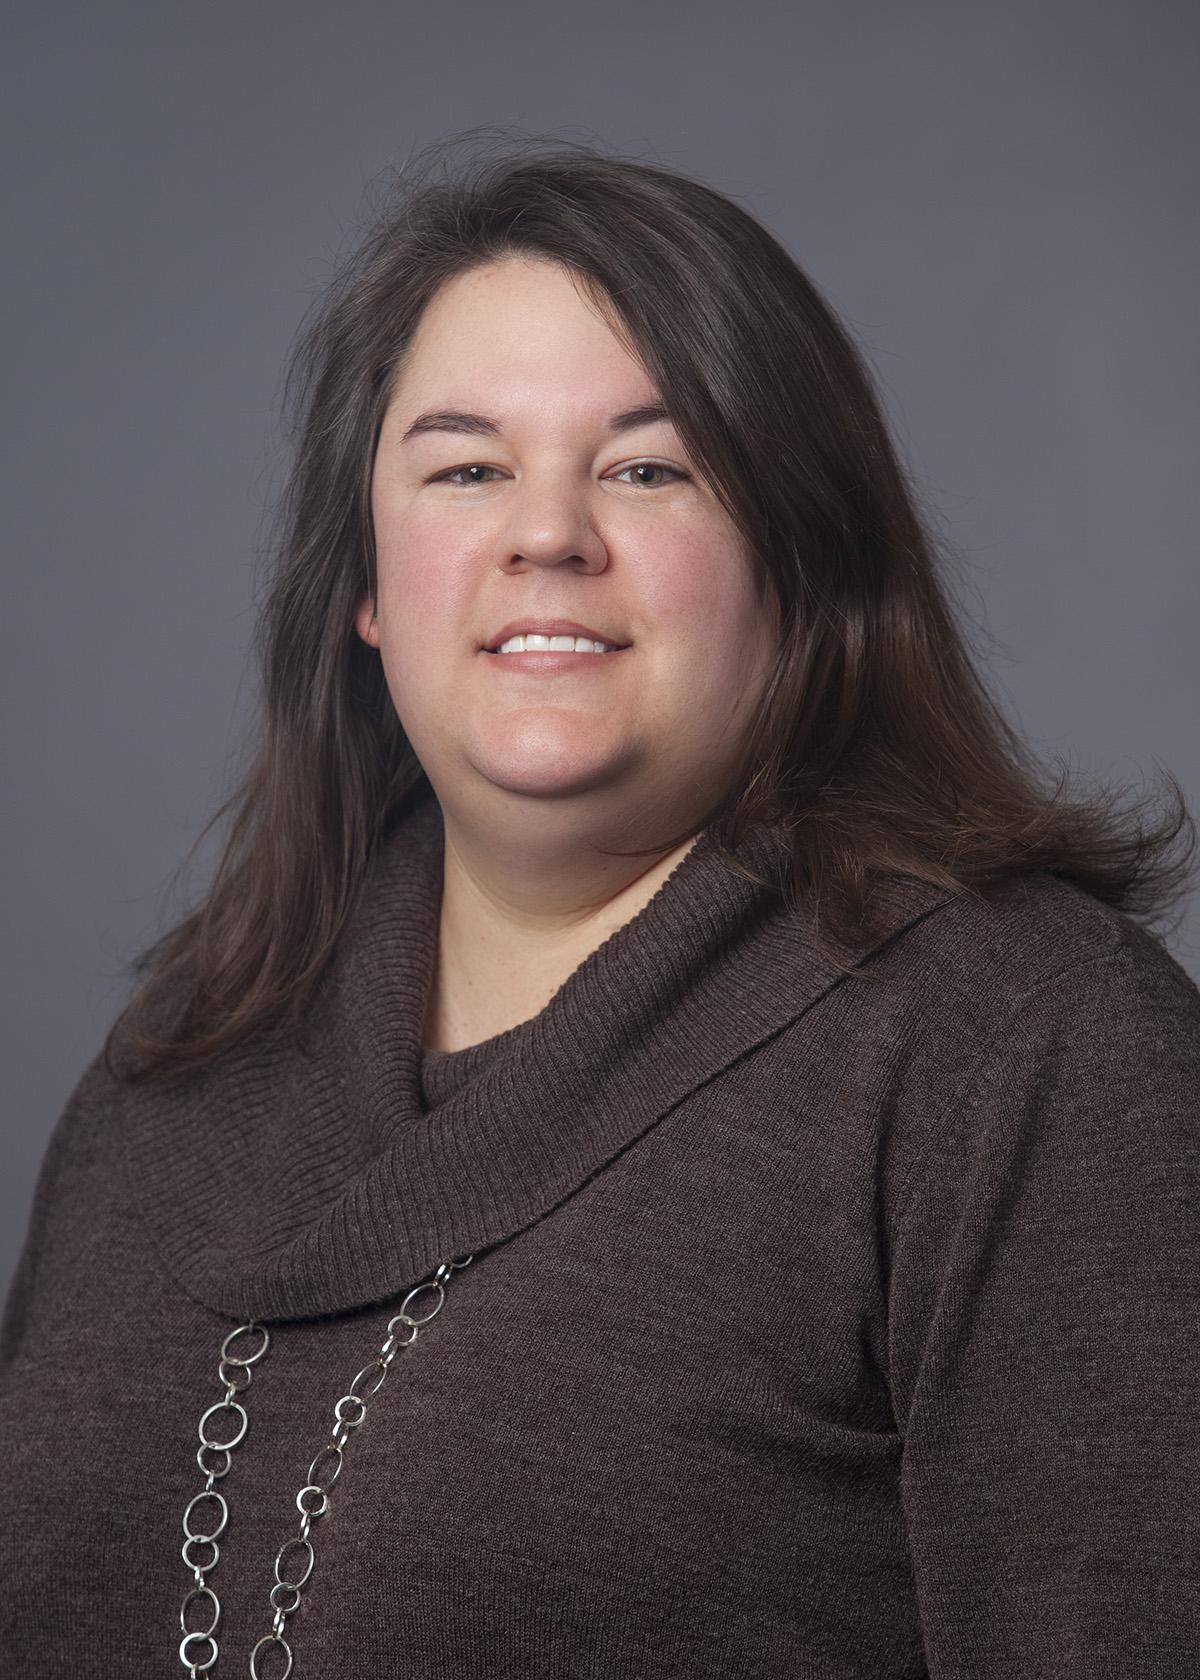 Cindy Vigil